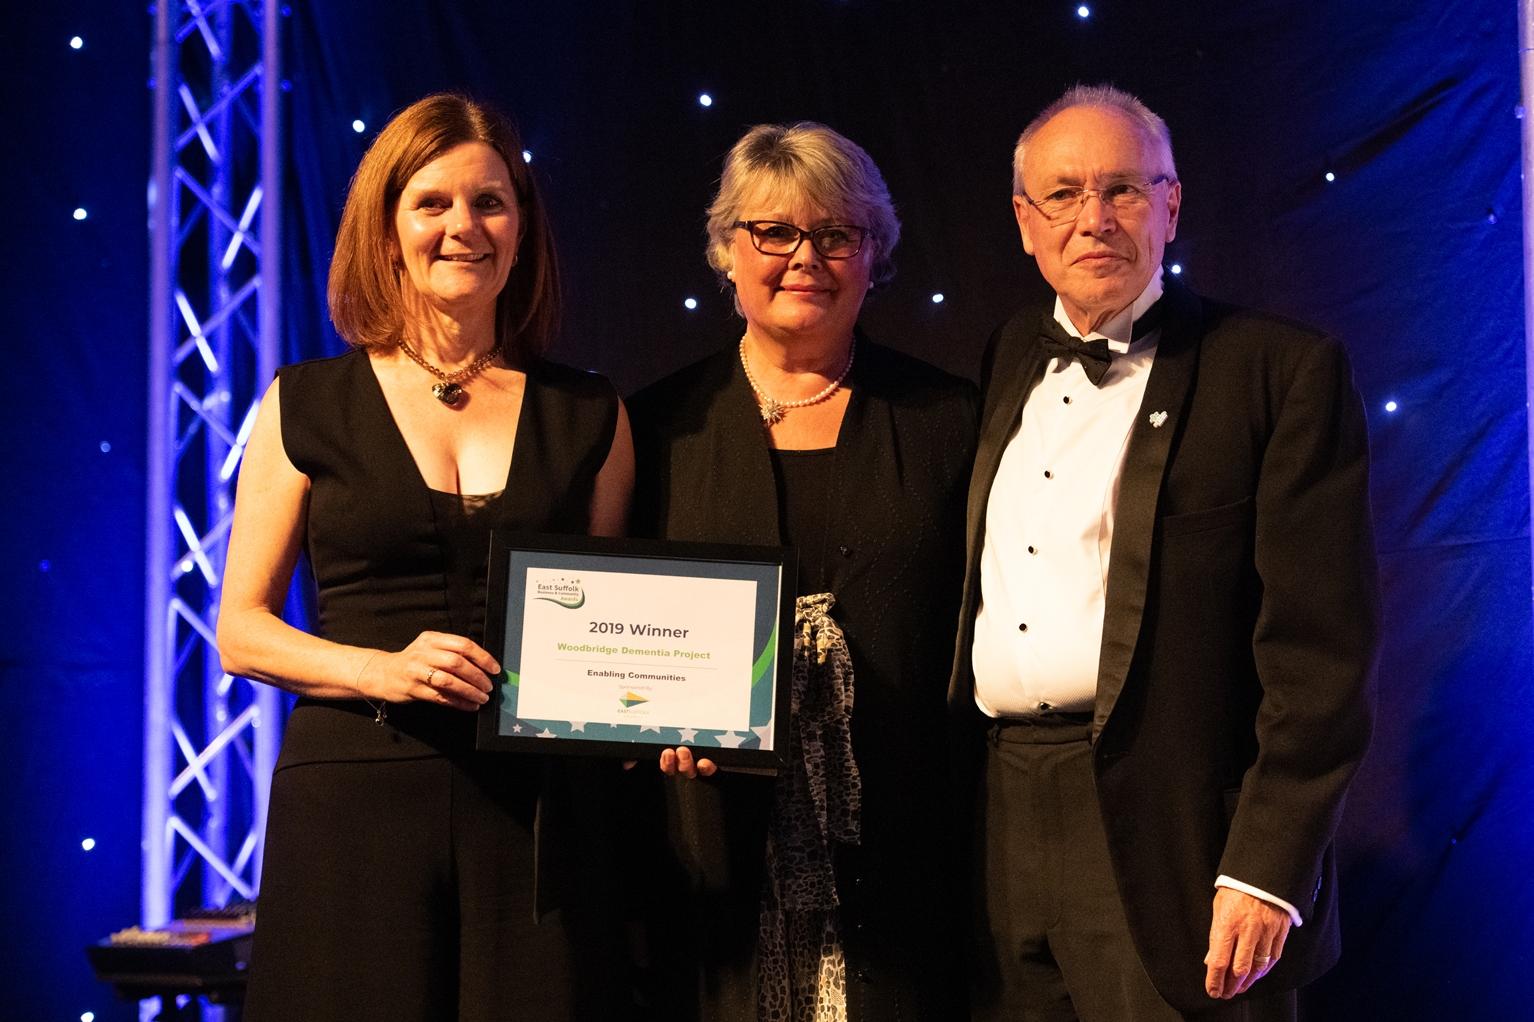 ESBCA Awards Enabling Communities Winners - The Dementia Project.jpg